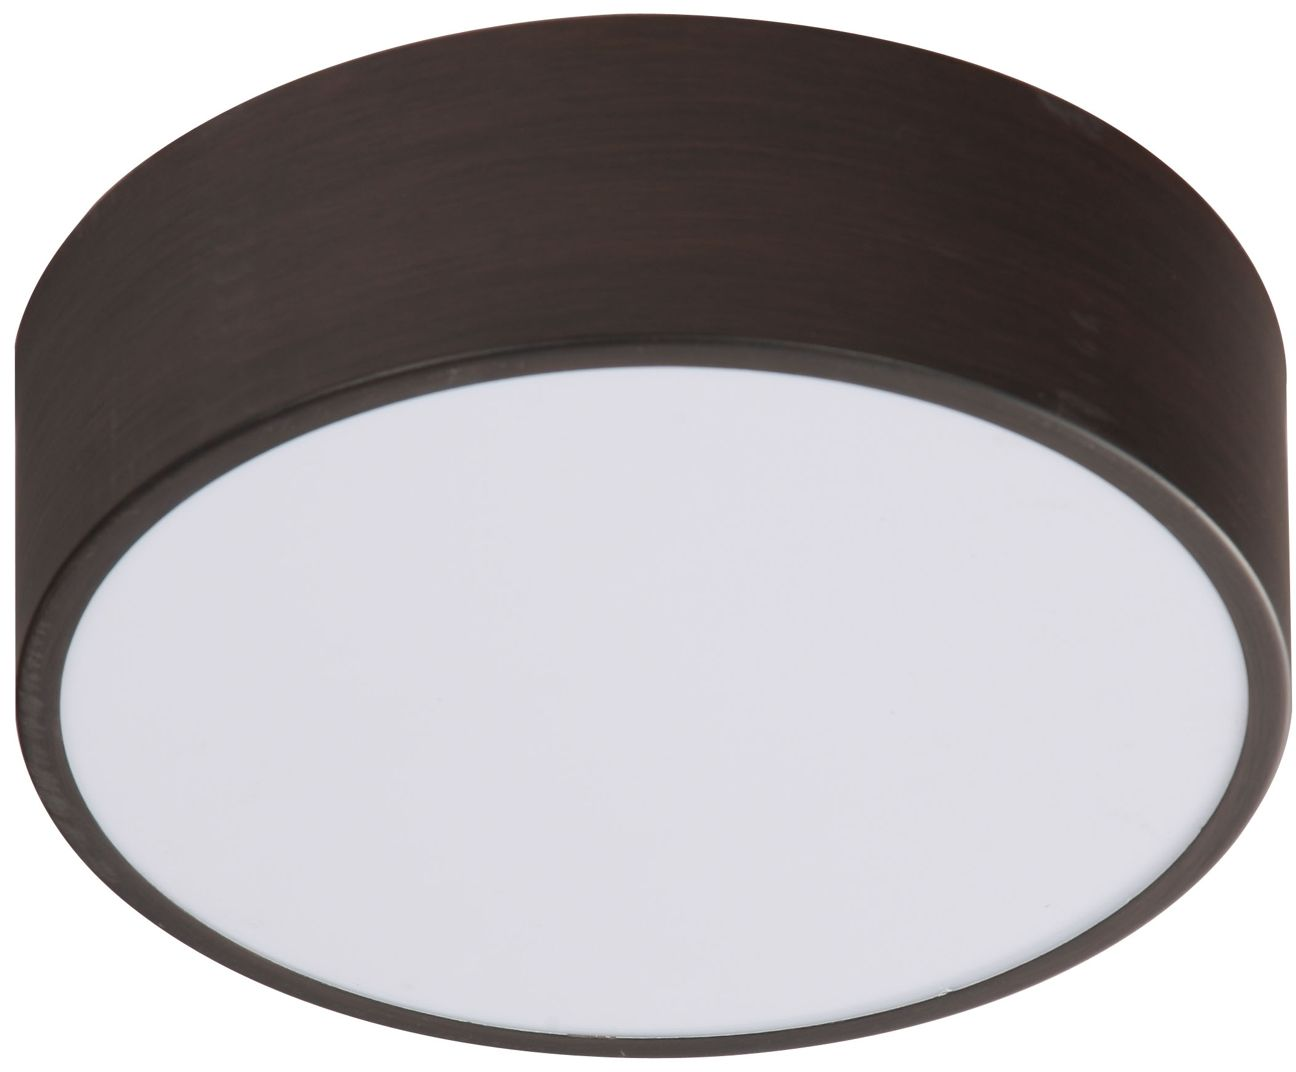 Candellux ZIGO 10-39545 LAMPA SUFITOWA plafon lampa sufitowa abażur wenge 10W LED 6500K 25cm